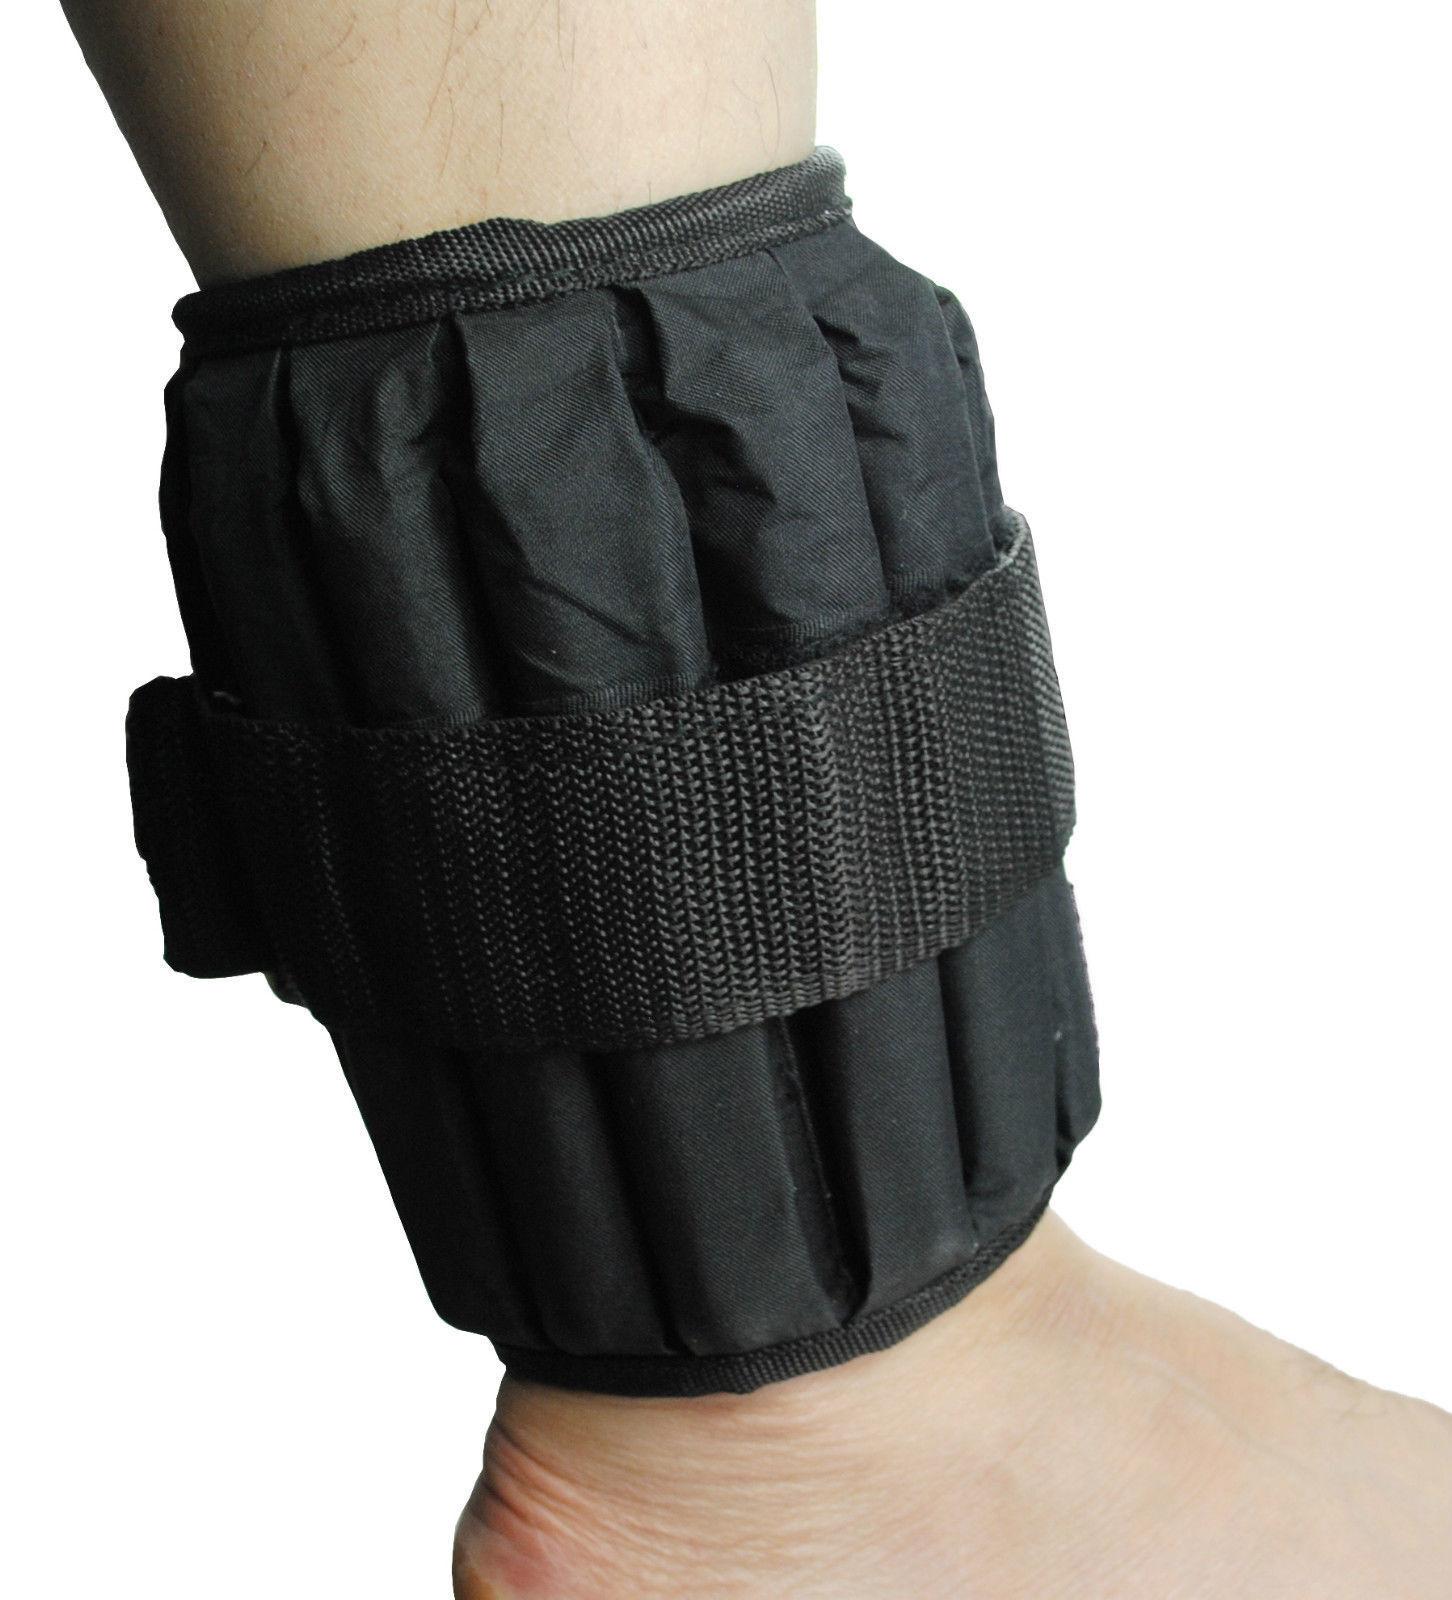 UK Warrior Verstellbar Knöchel Handgelenk Gewichte Fitness Laufen Joggen PAAR 10